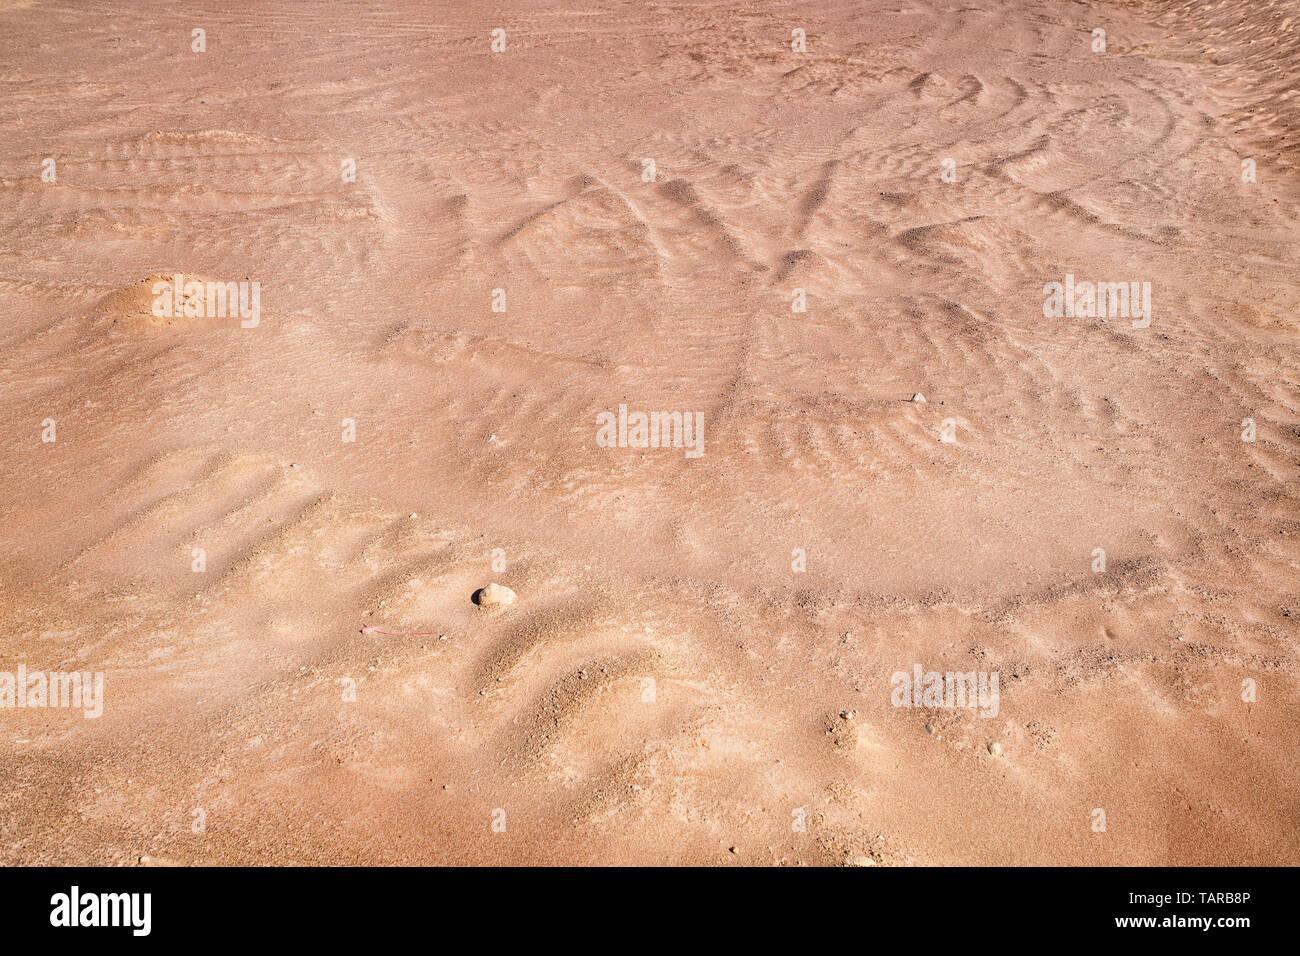 Empty sandy plain surface. Martian like deserted landscape - Stock Image